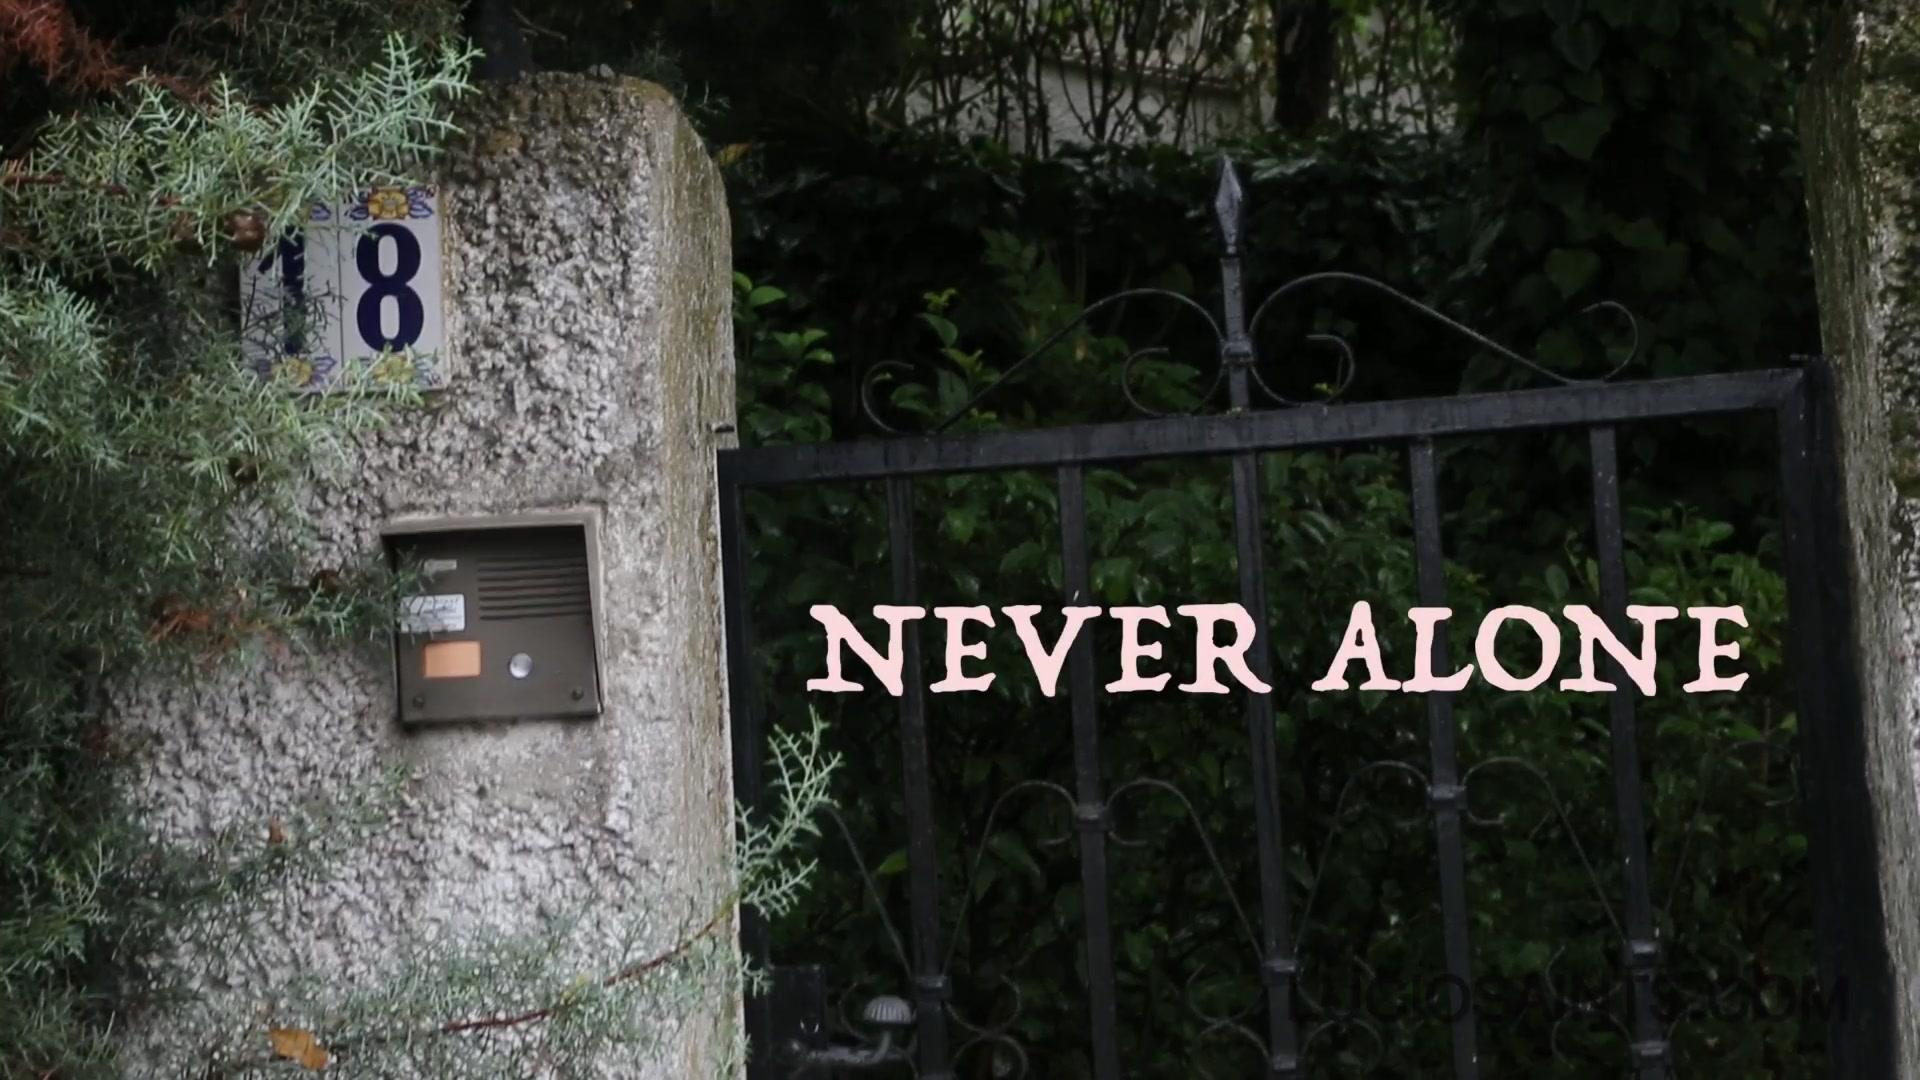 Ares Camacho Porno never alone - ares camacho, yoshi kawasaki gay porno hd online